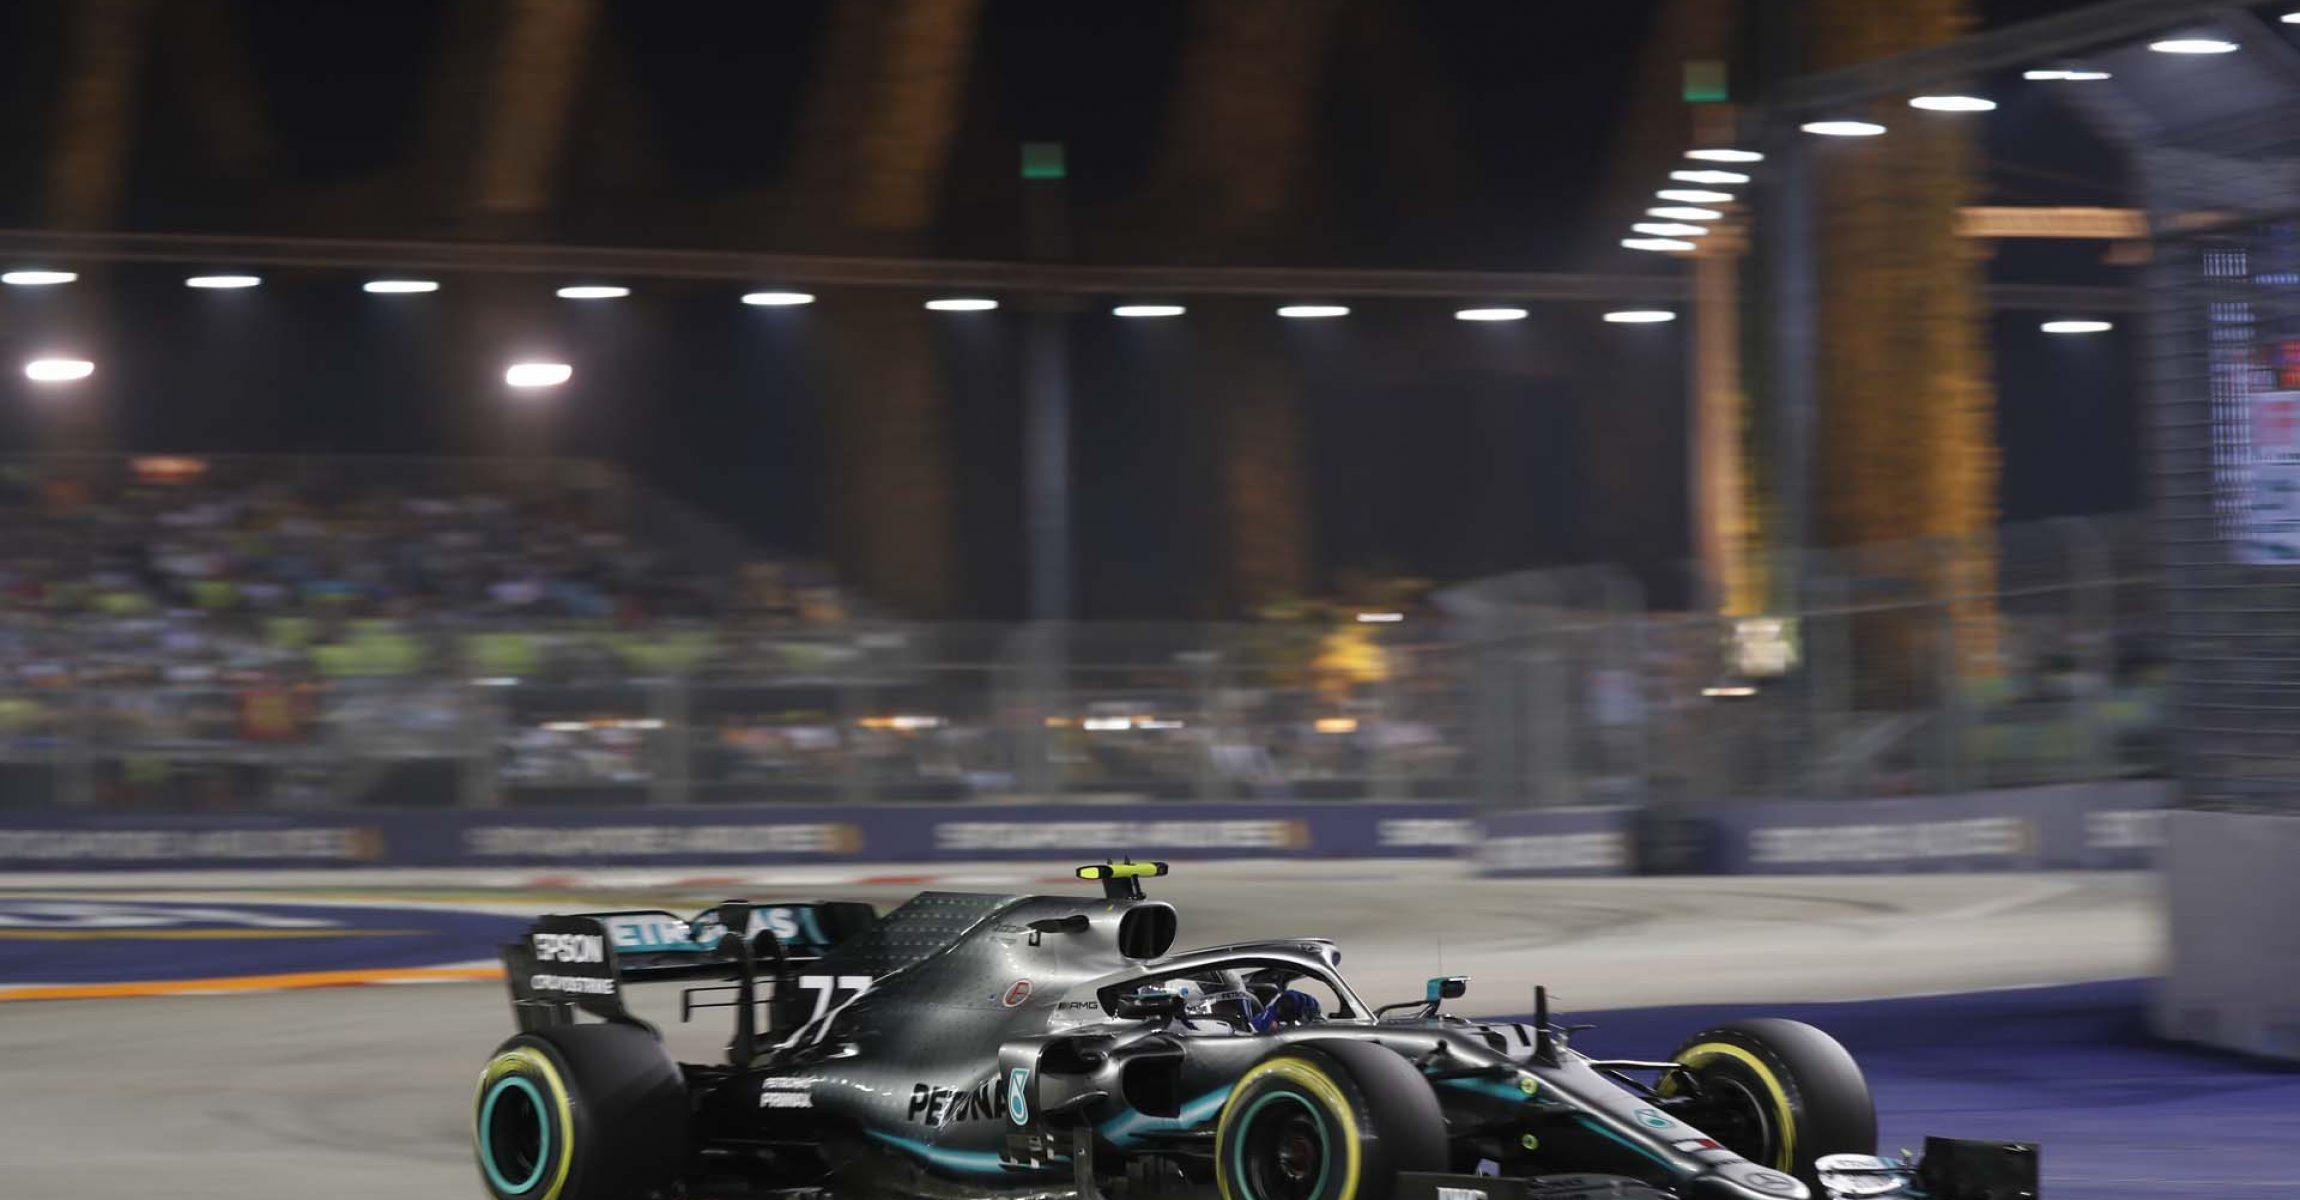 2019 Singapore Grand Prix, Saturday - Wolfgang Wilhelm Valtteri Bottas Mercedes